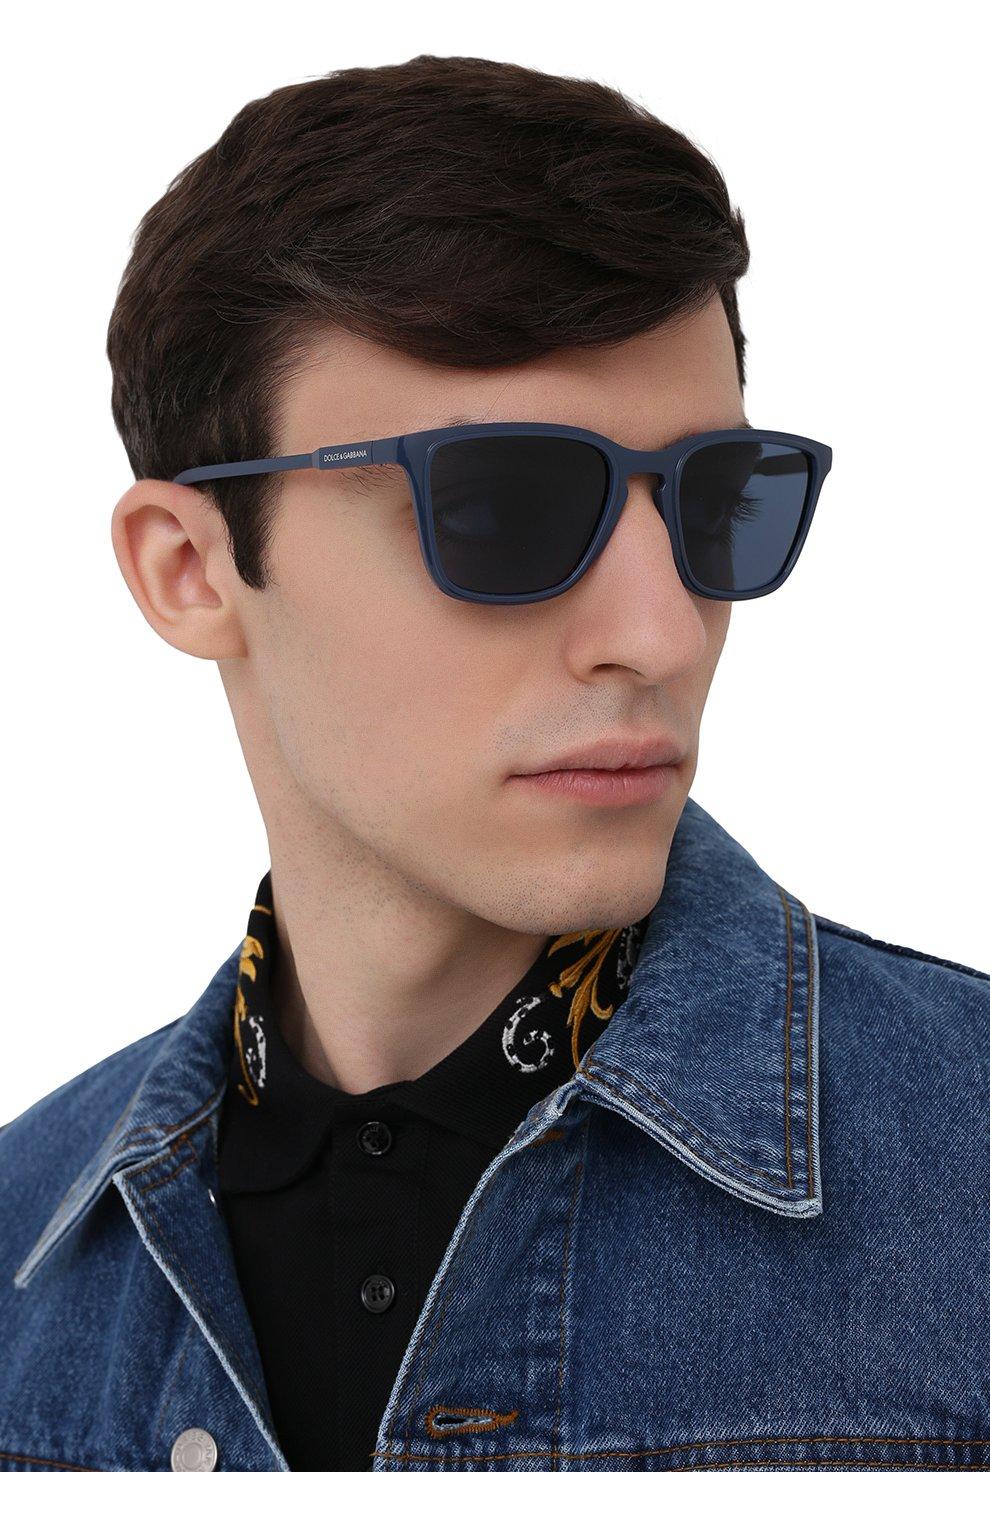 Мужские солнцезащитные очки DOLCE & GABBANA синего цвета, арт. 6145-329480   Фото 2